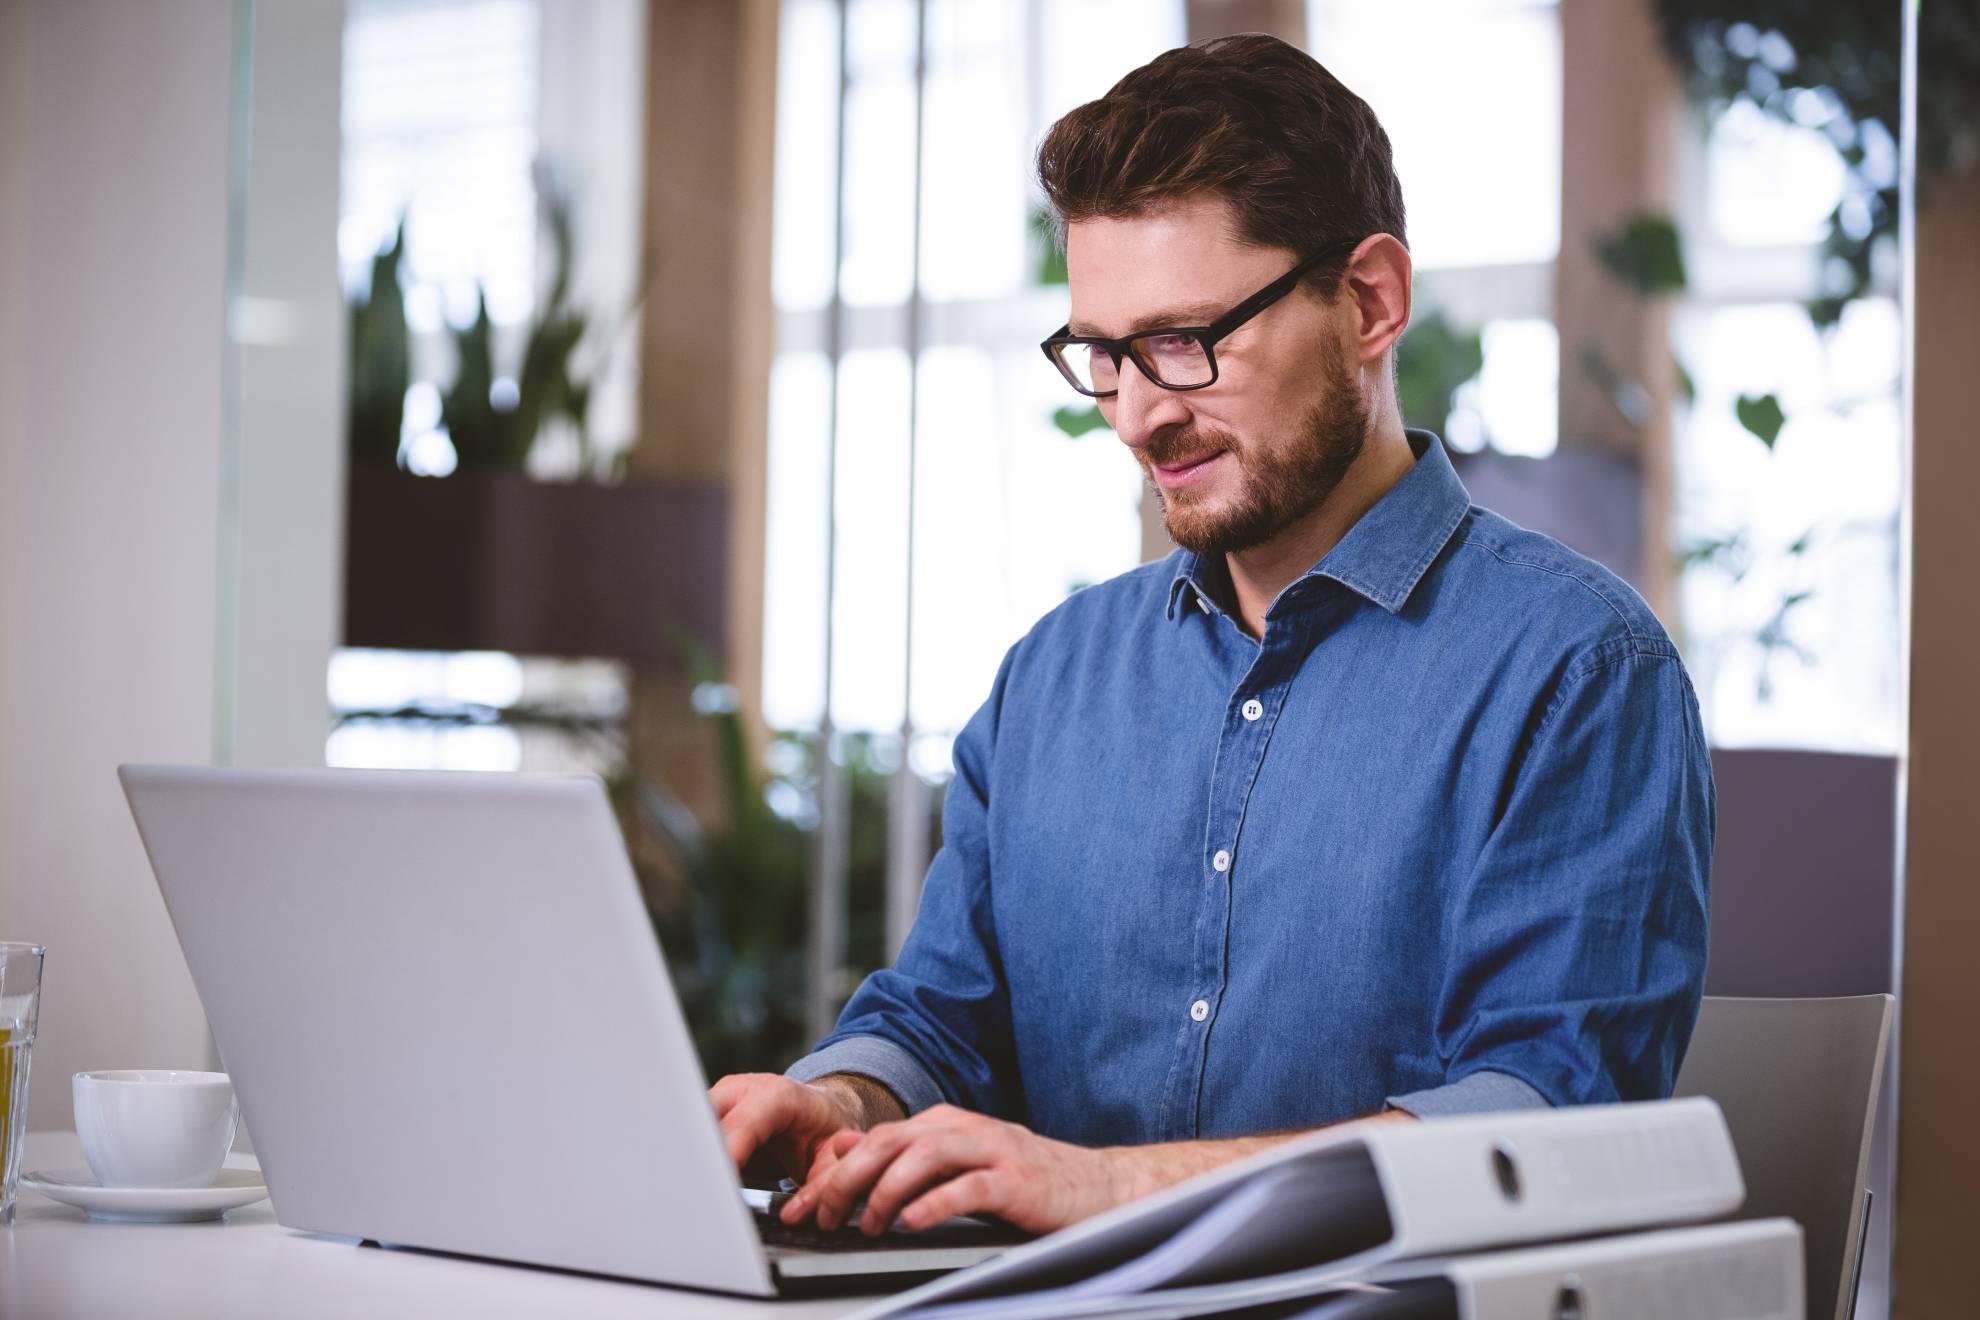 confident-businessman-working-on-laptop-at-creativ-ULR2F3K (1)